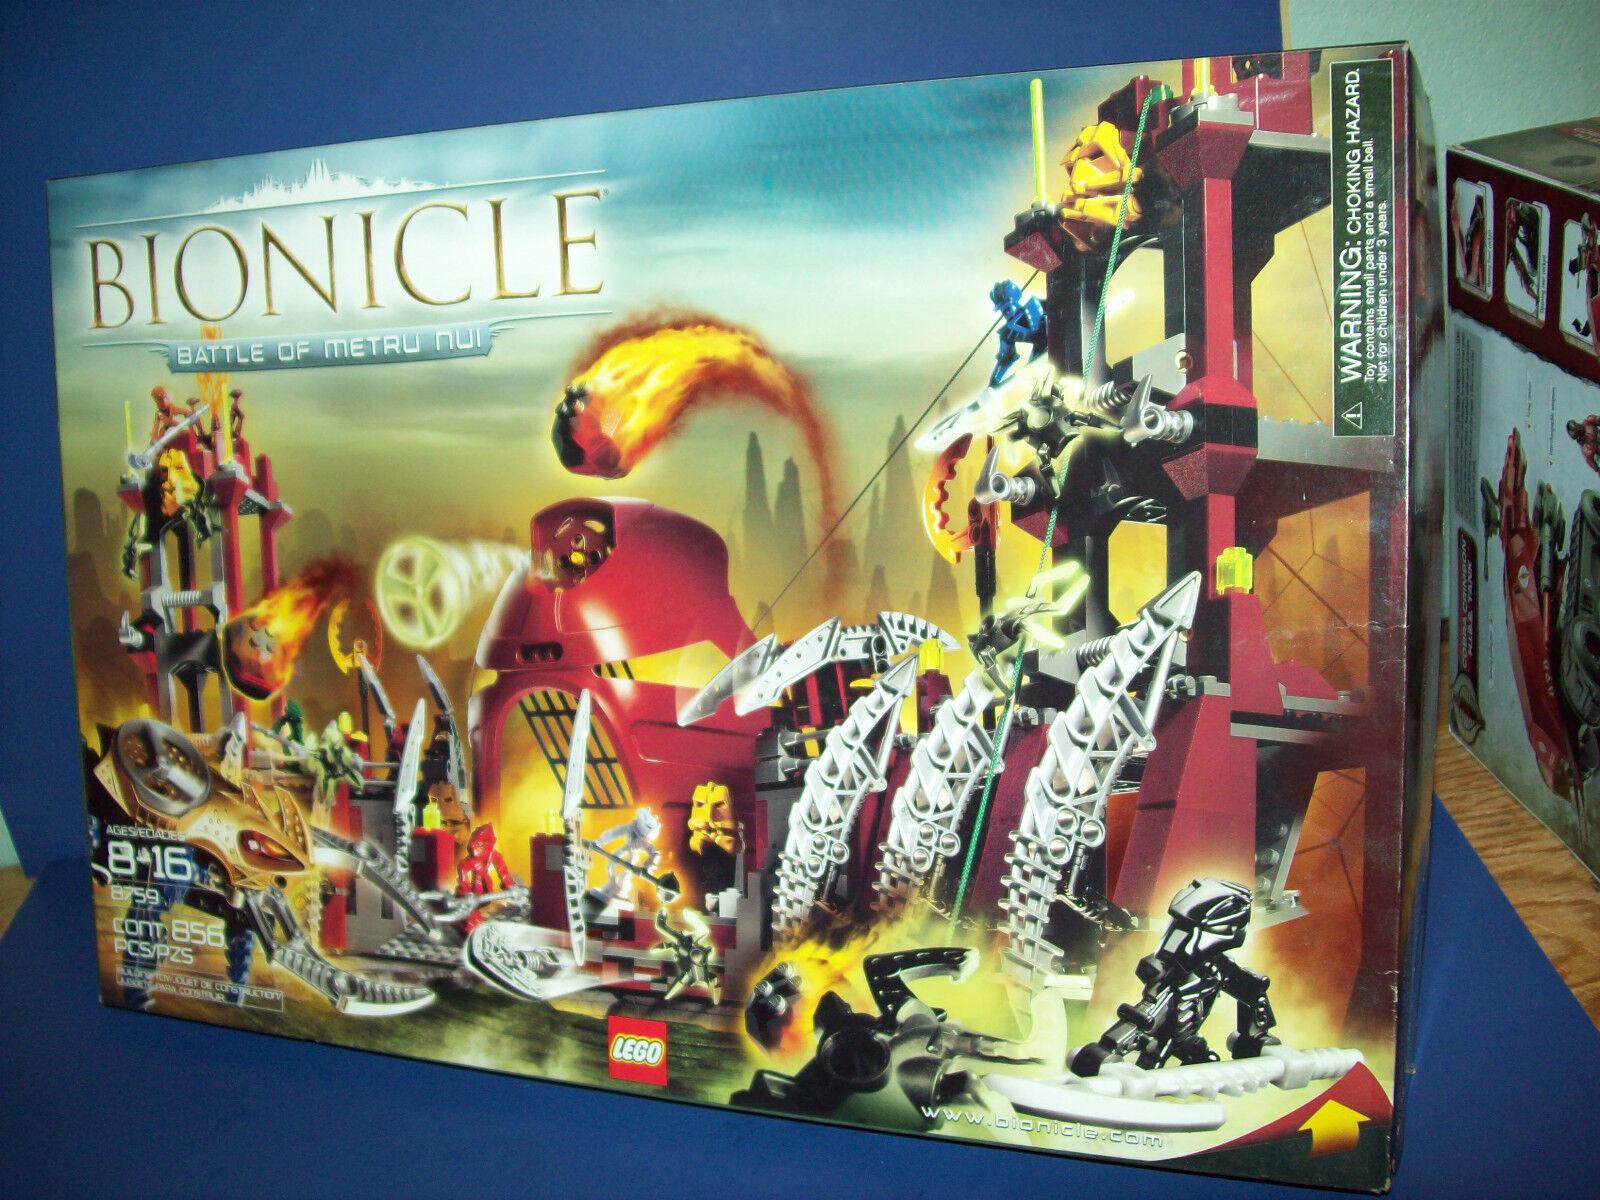 Lego 8759 Bionicle - Kampf von Metru Nui - Im Ruhestand Versiegelt Neu 856